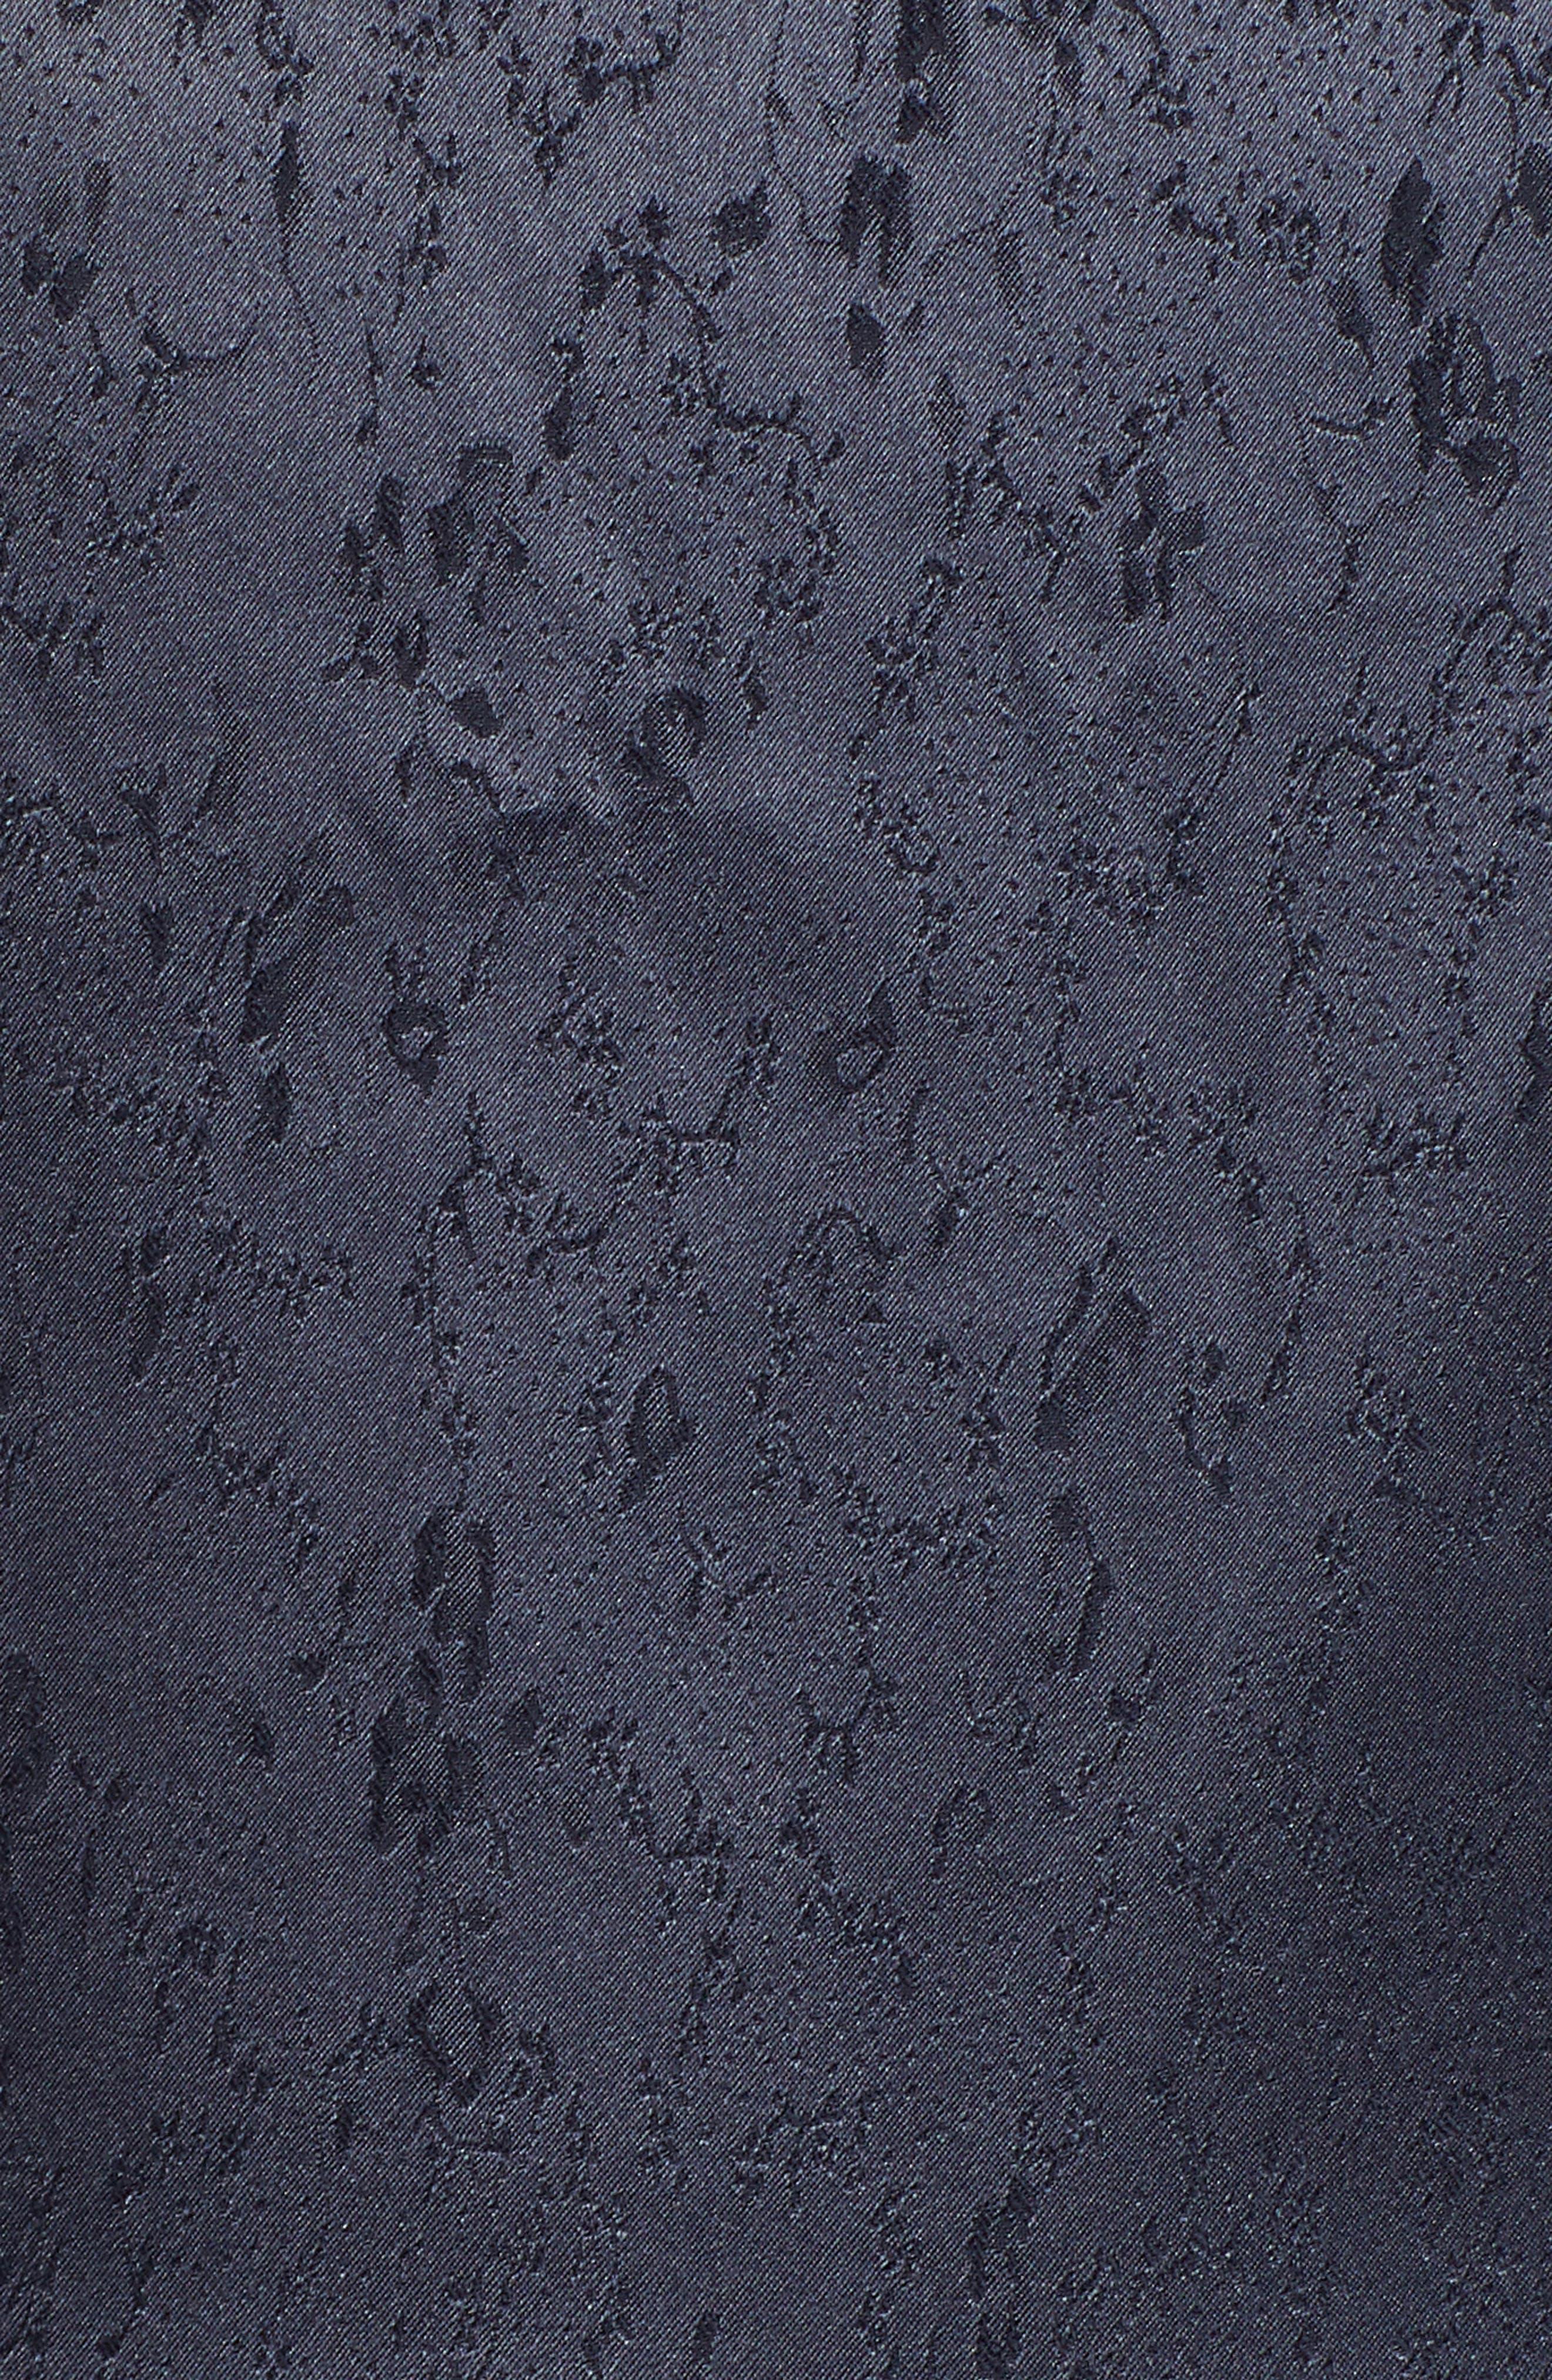 Ruffle Hem Minidress,                             Alternate thumbnail 6, color,                             NAVY NIGHT